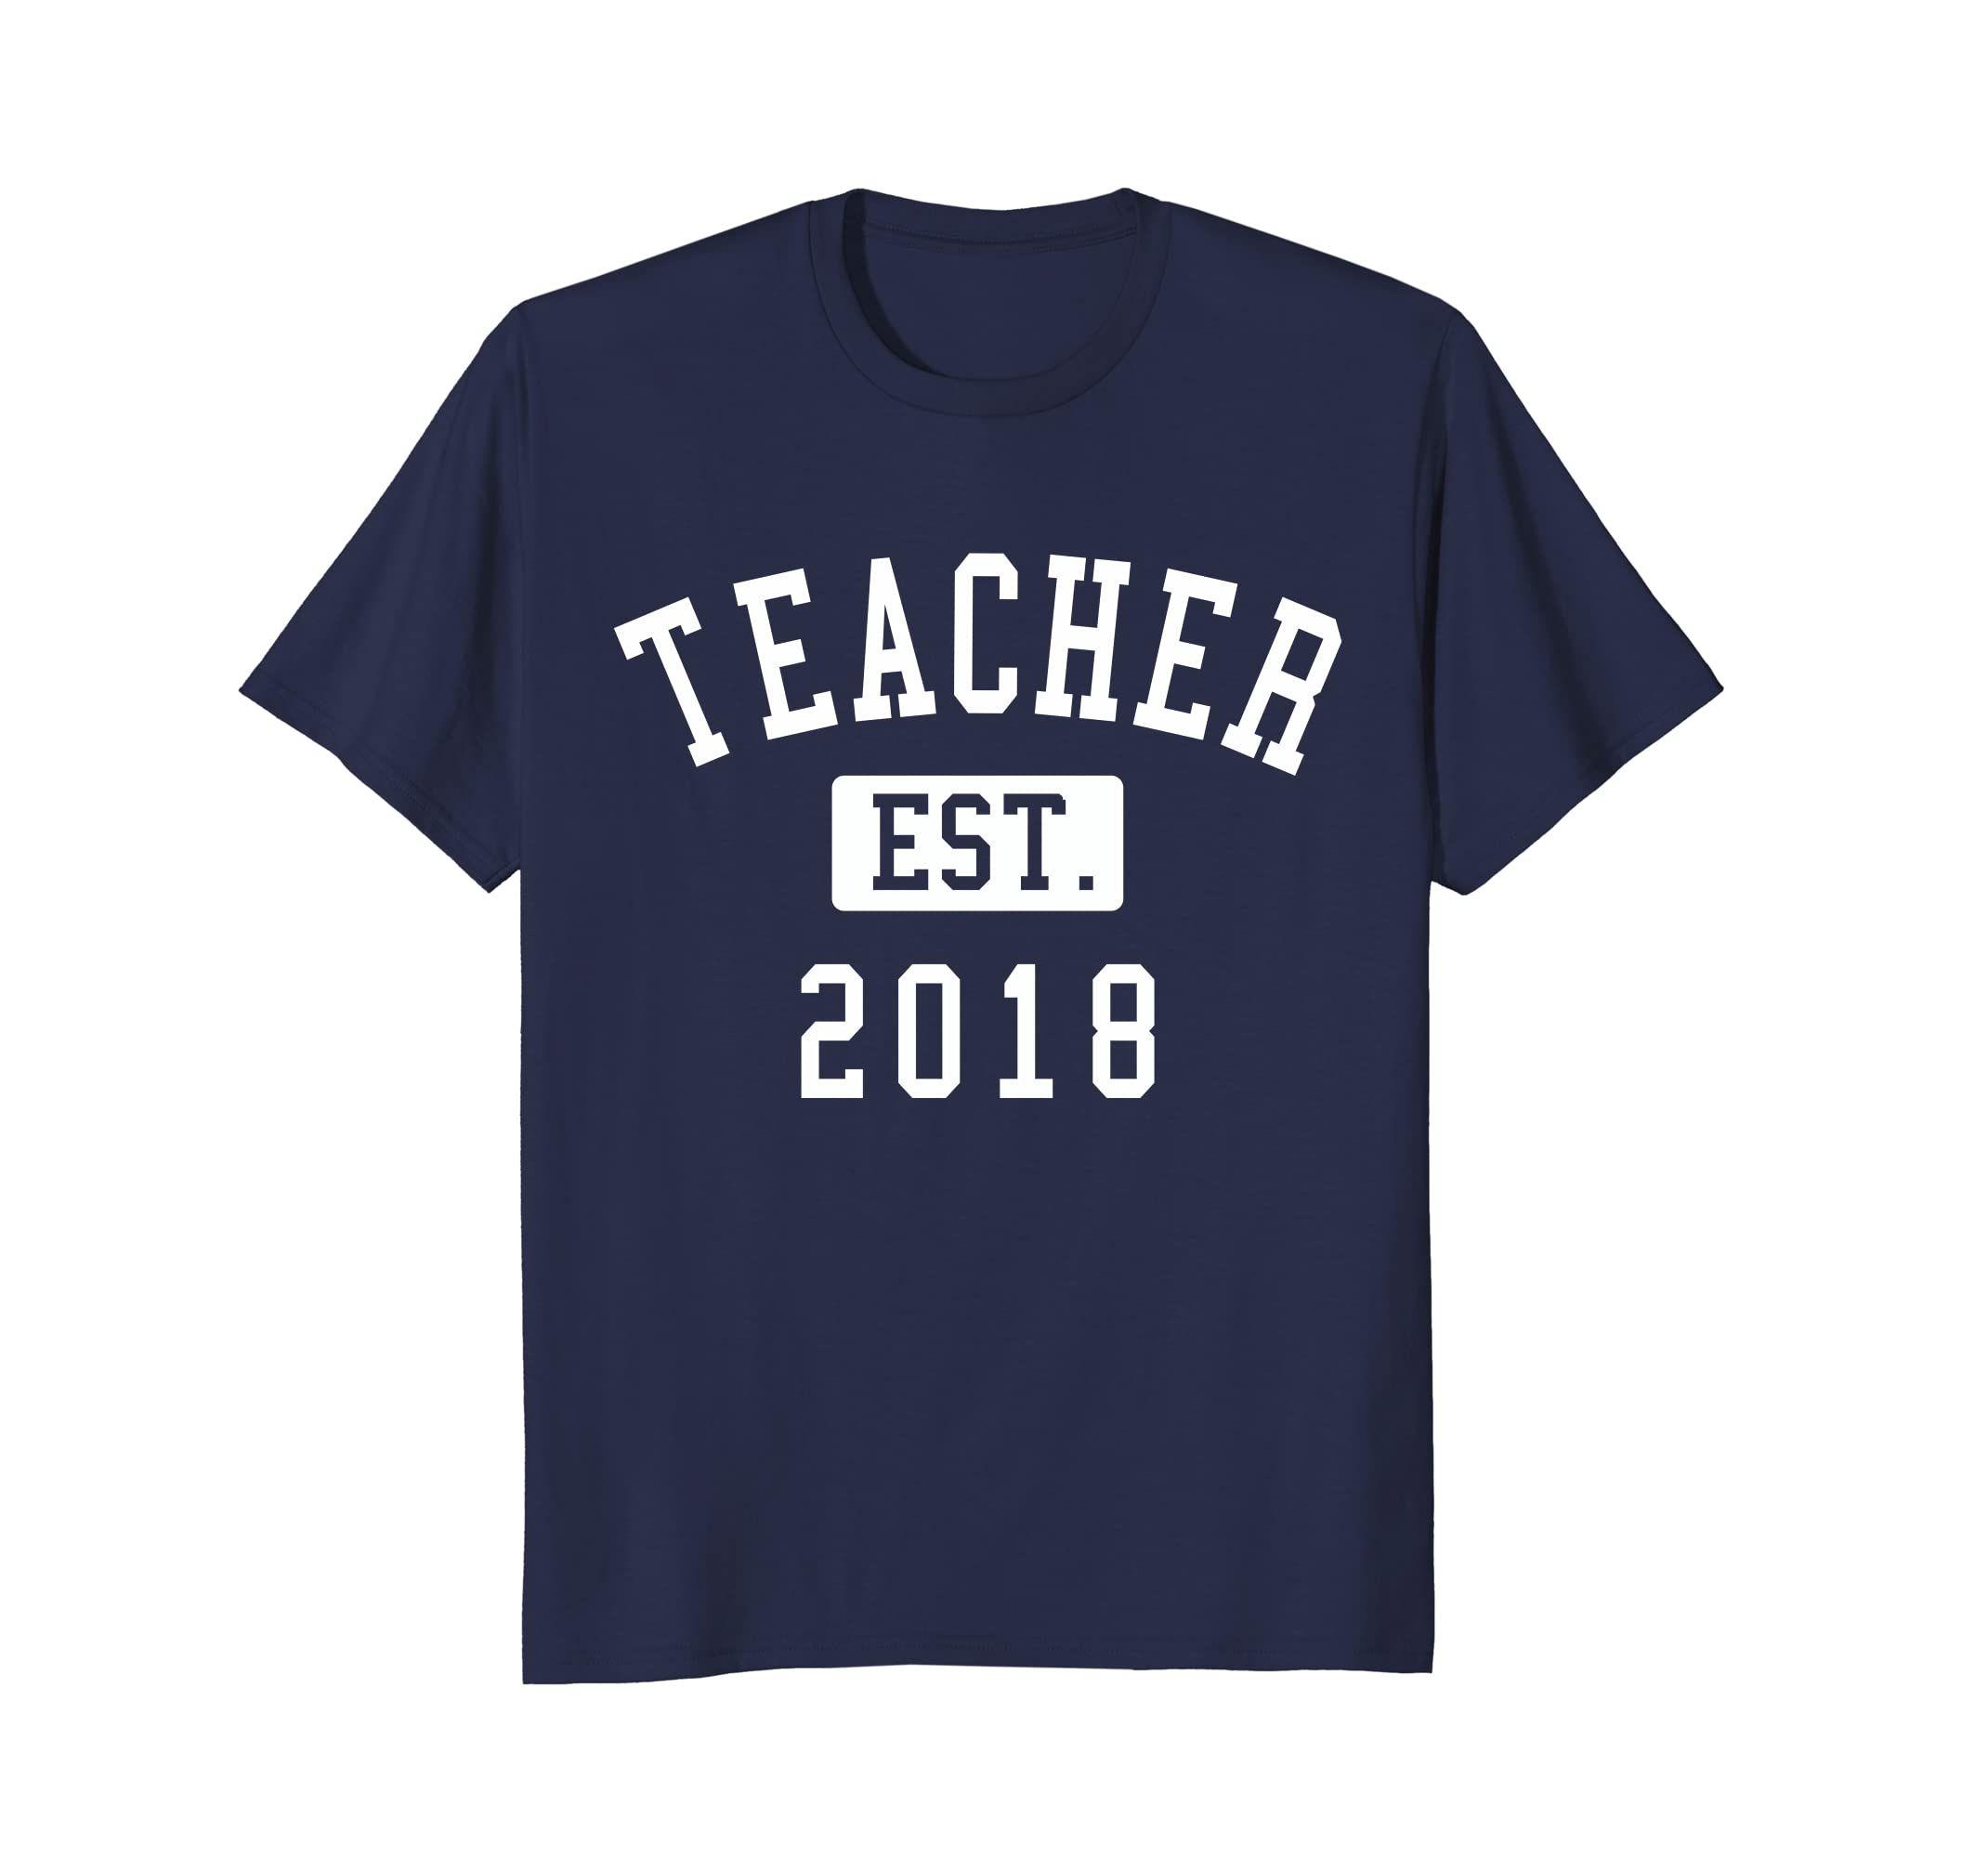 Teacher established 2018 Shirt - Gift for Teacher Graduation-Awarplus